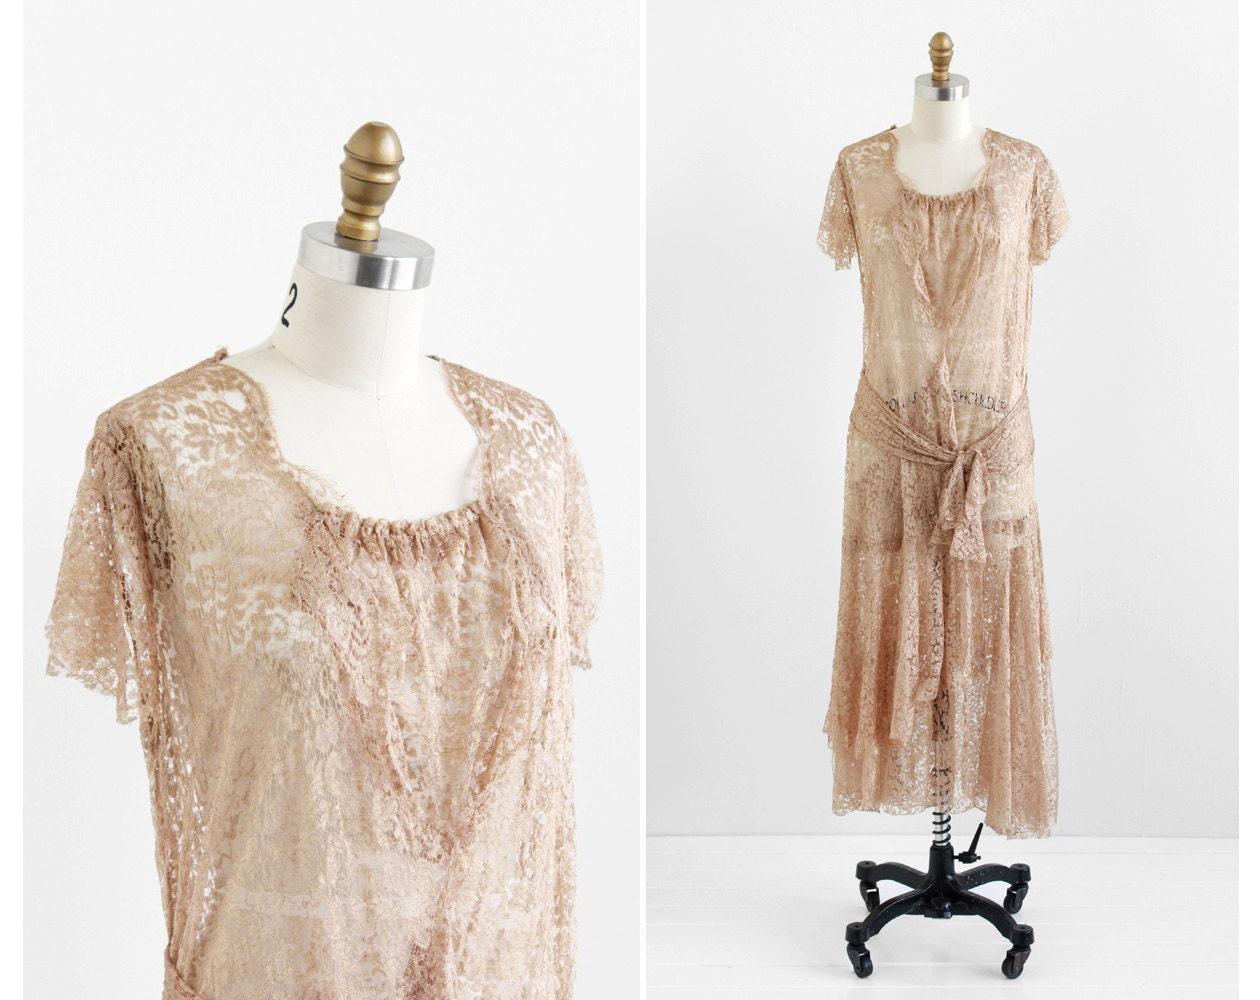 Vintage 1920s Dress 20s Dress Champagne Silk Lace Flapper